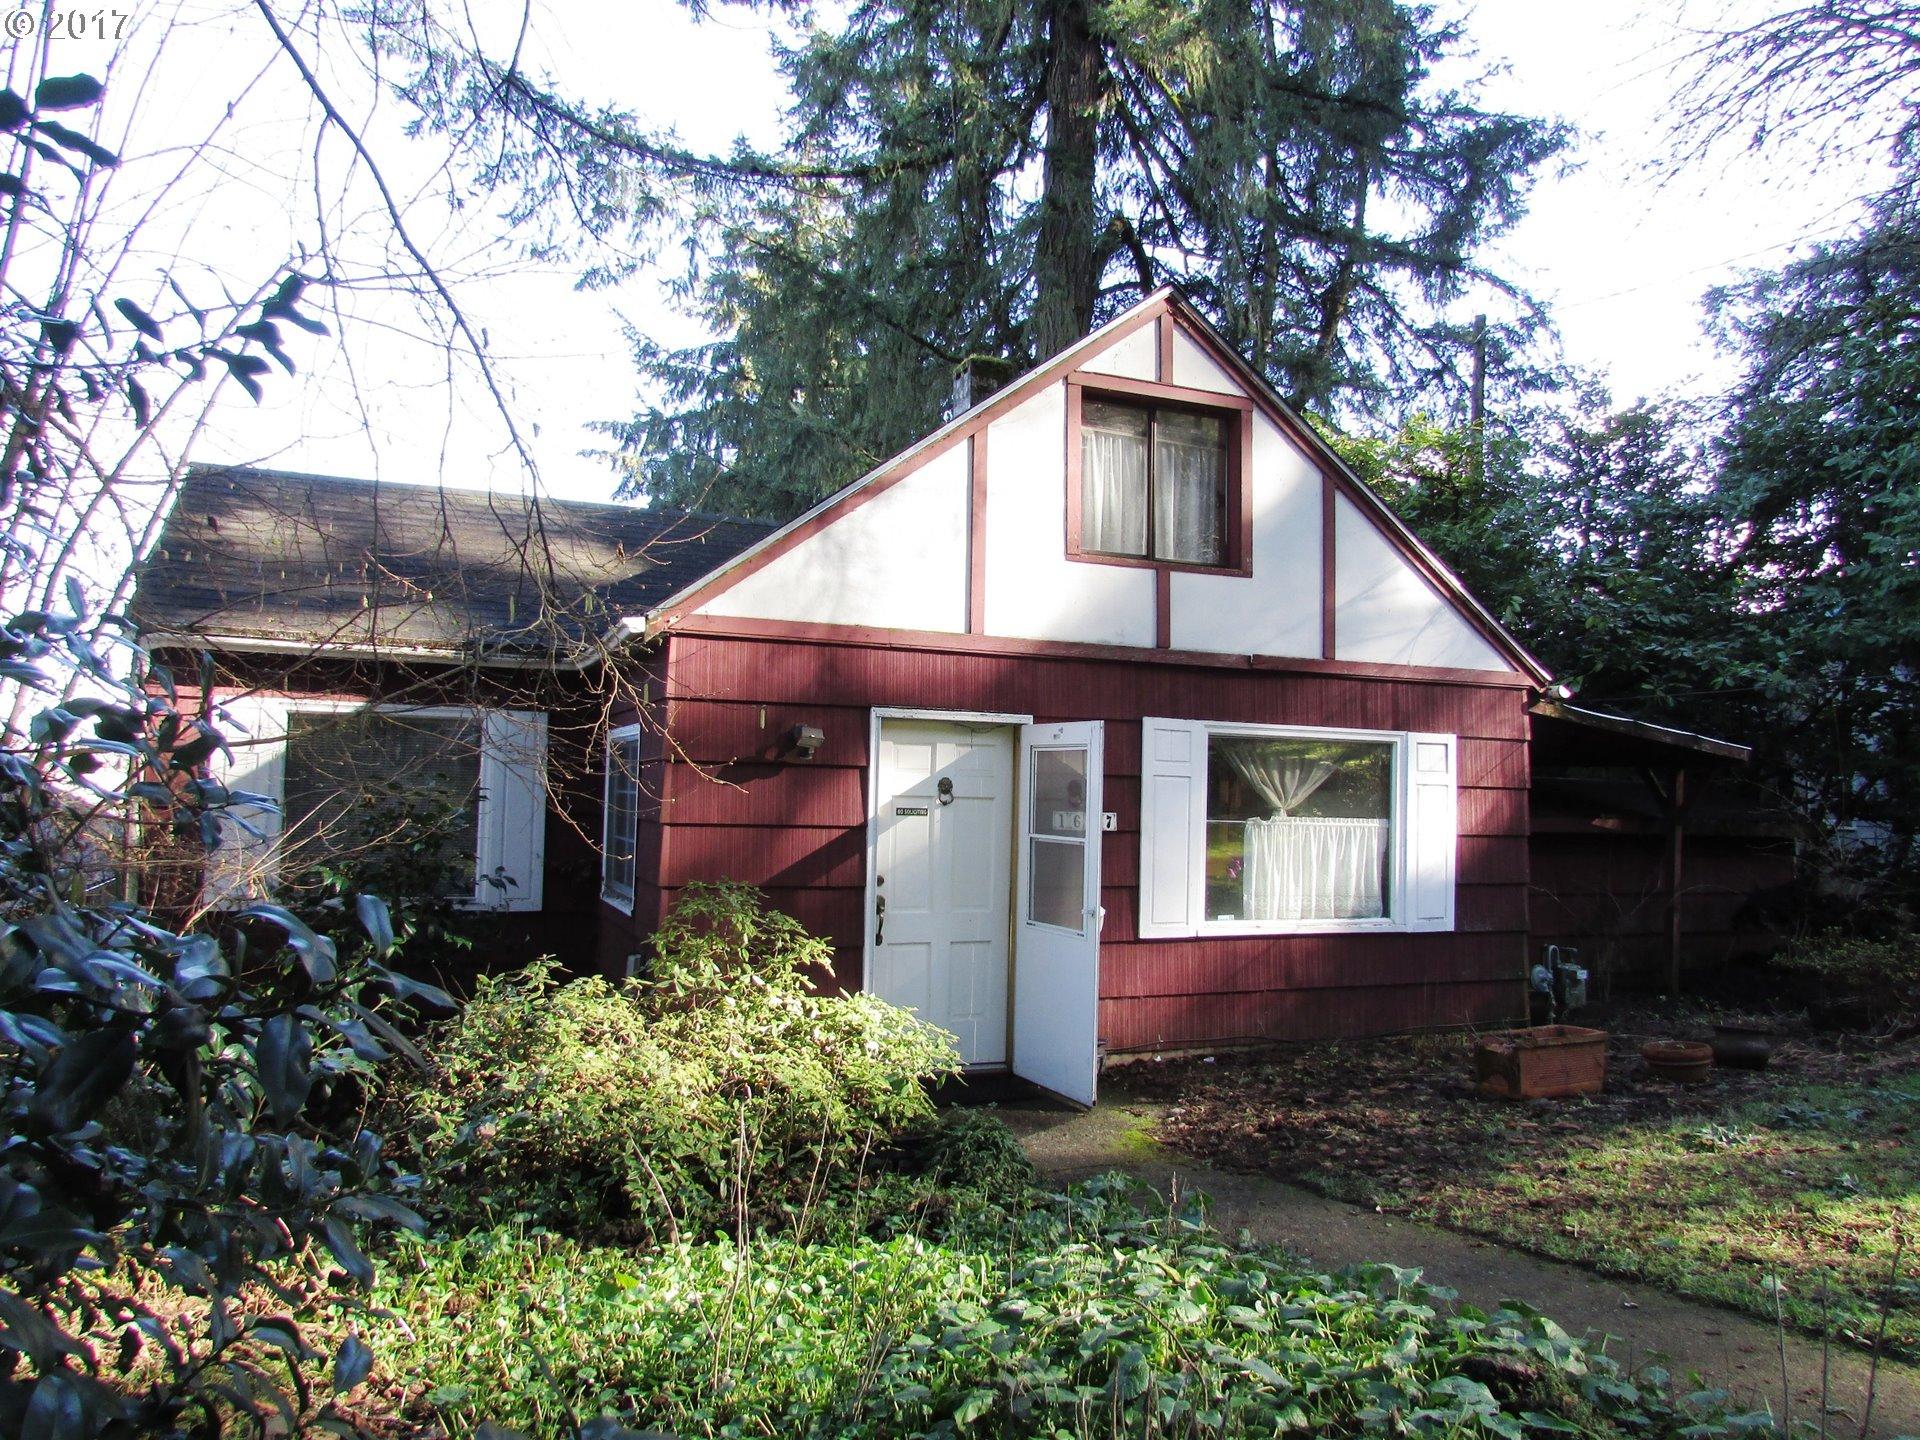 1697 RIVERVIEW ST, Eugene, OR 97403